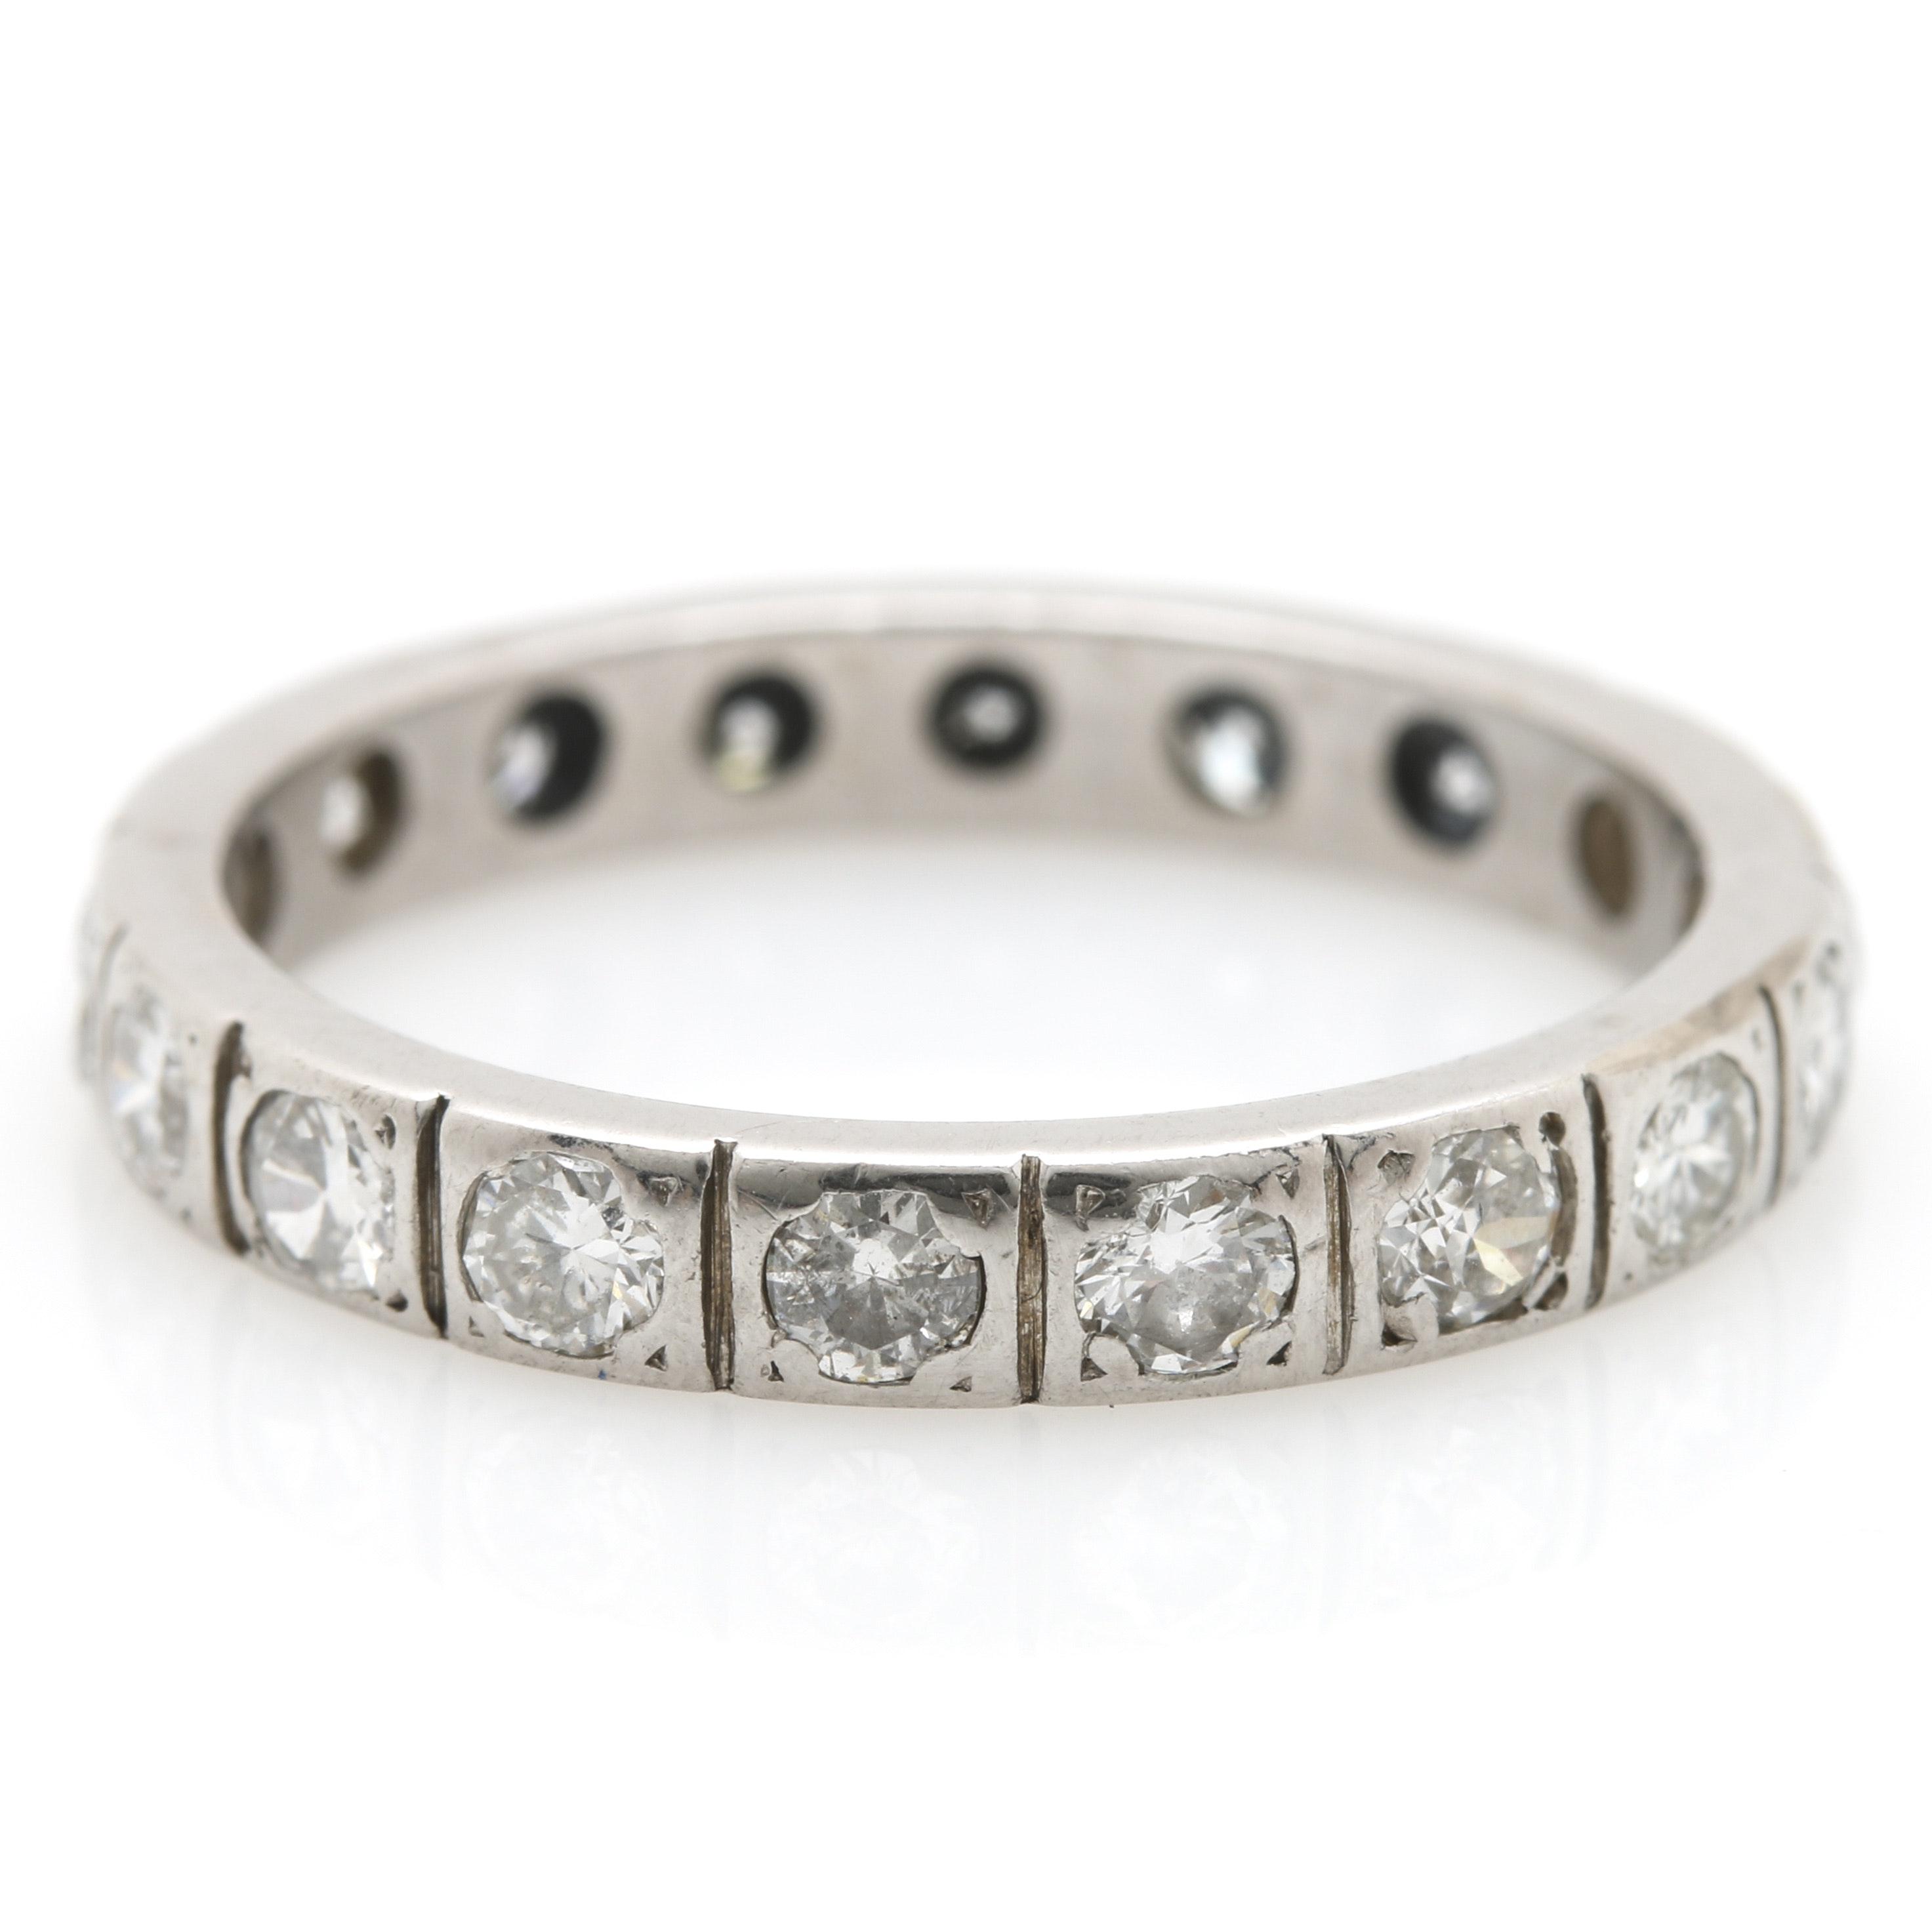 14K White Gold 1.08 CTW Diamond Infinity Band